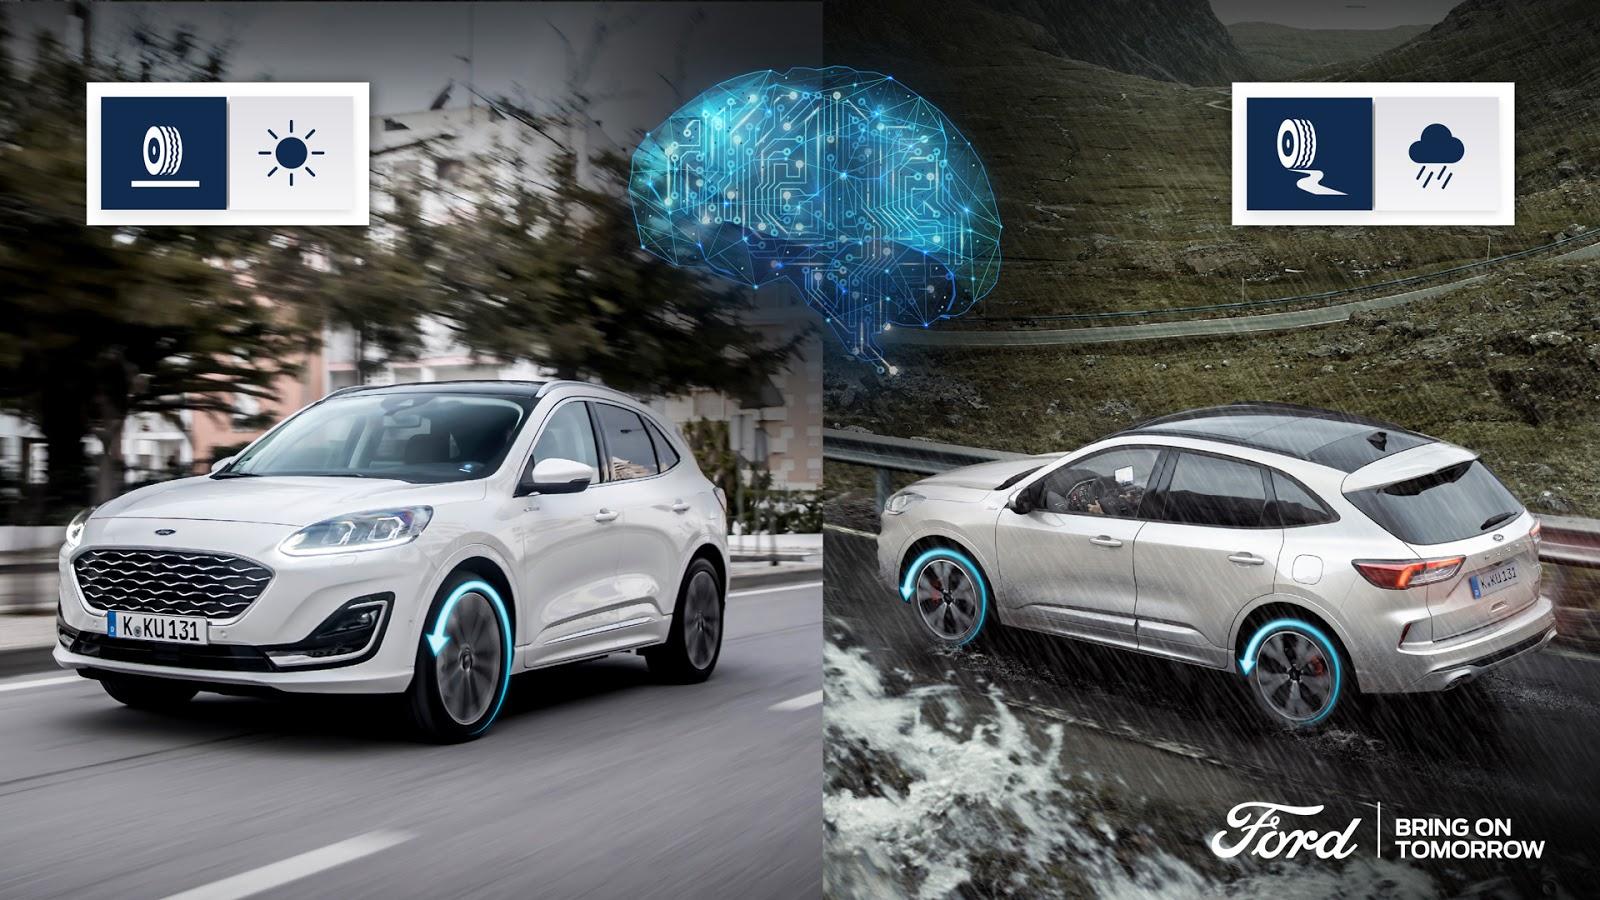 Kuga iAWD graphic Η τεχνητη νοημοσυνη στo συστημα τετρακινησης του Ford Kuga